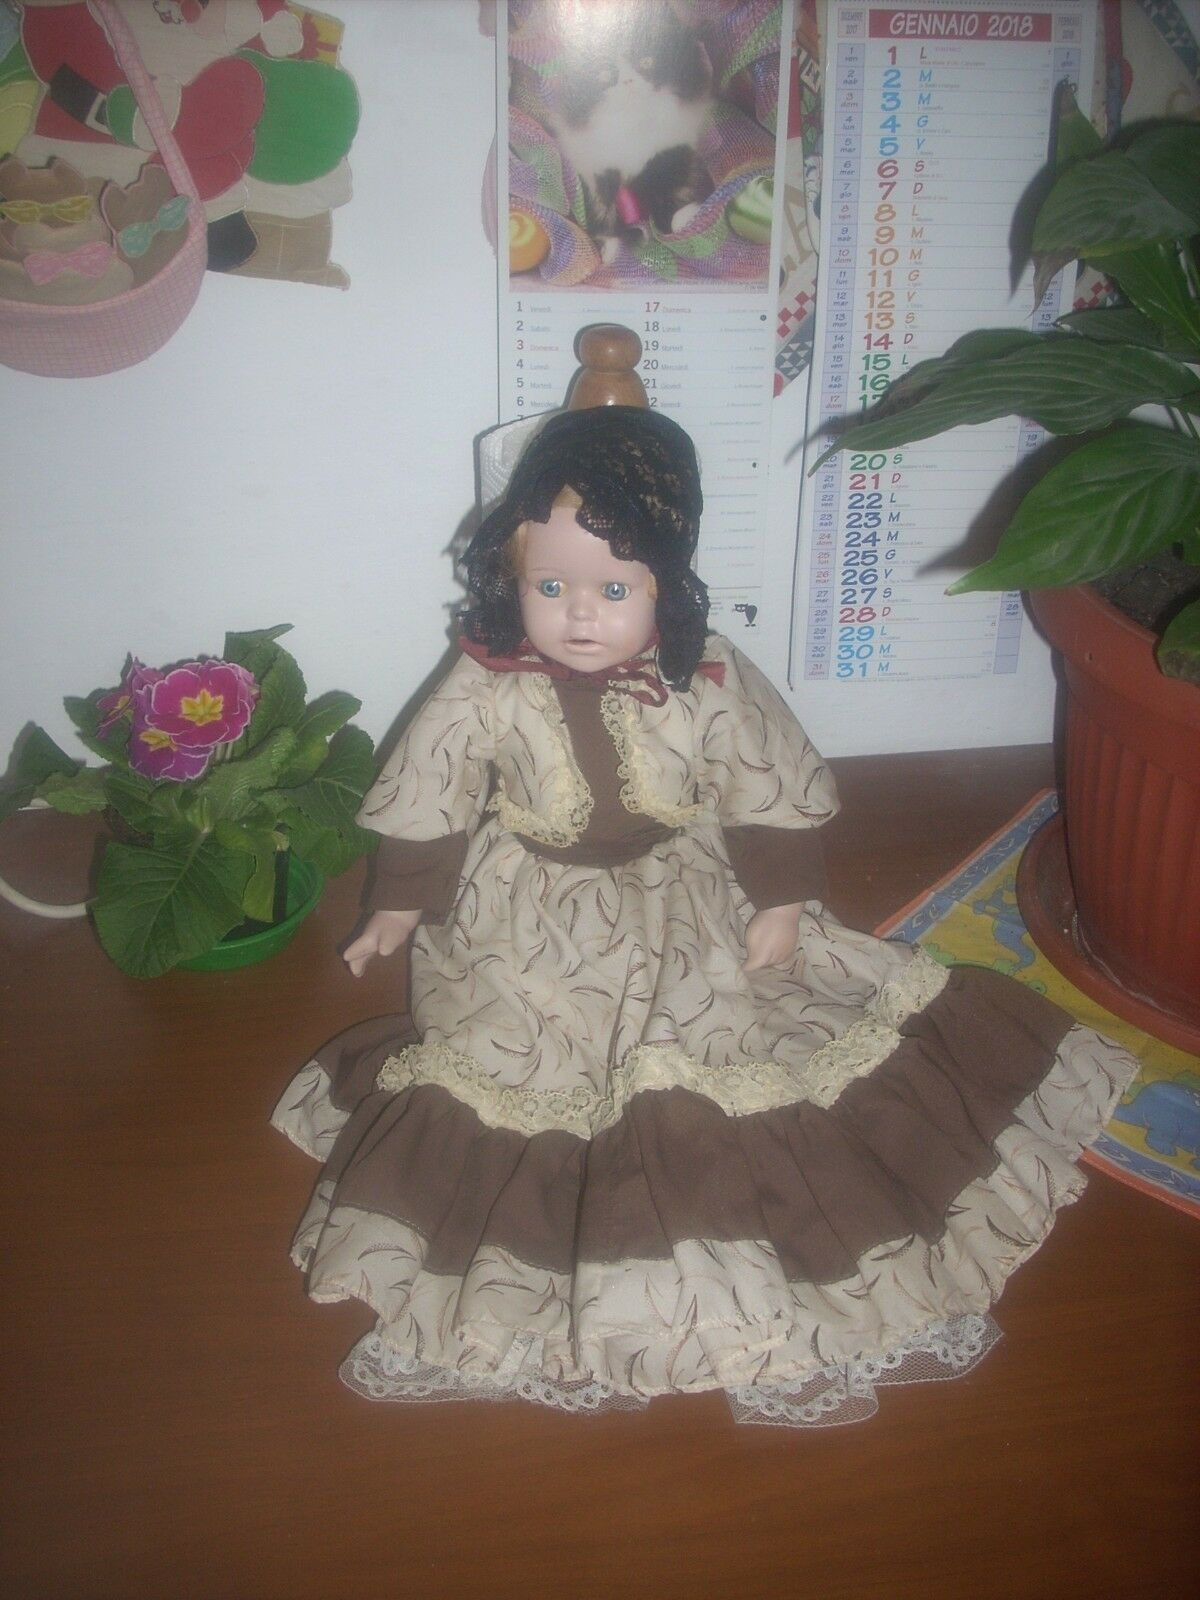 Bambola in porcellana o bisquit  con difetti cm.36 vintage leggi....